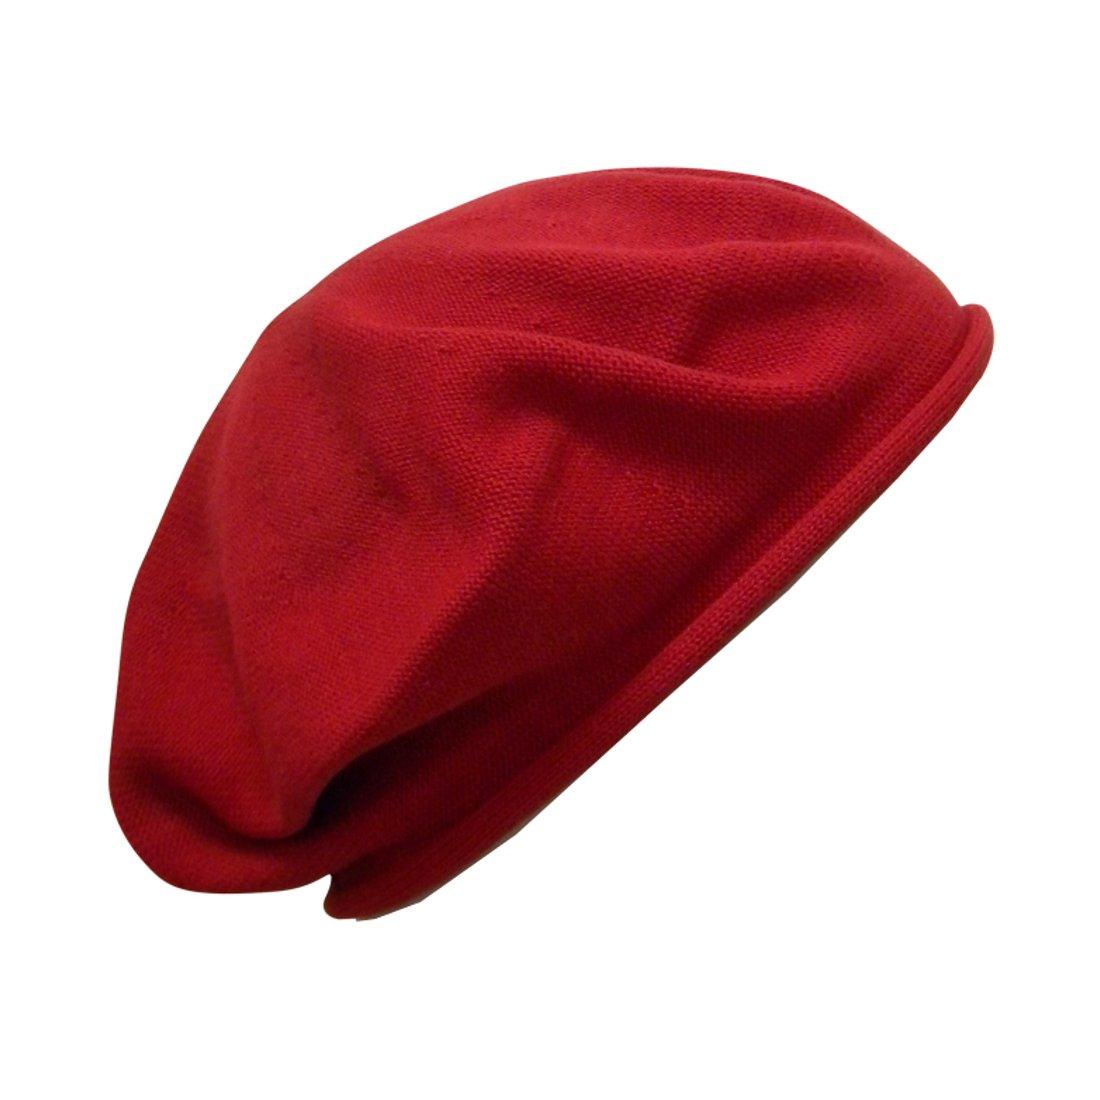 Landana Headscarves Beret for Women 100% Cotton Solid ldbt-solid-black-SF